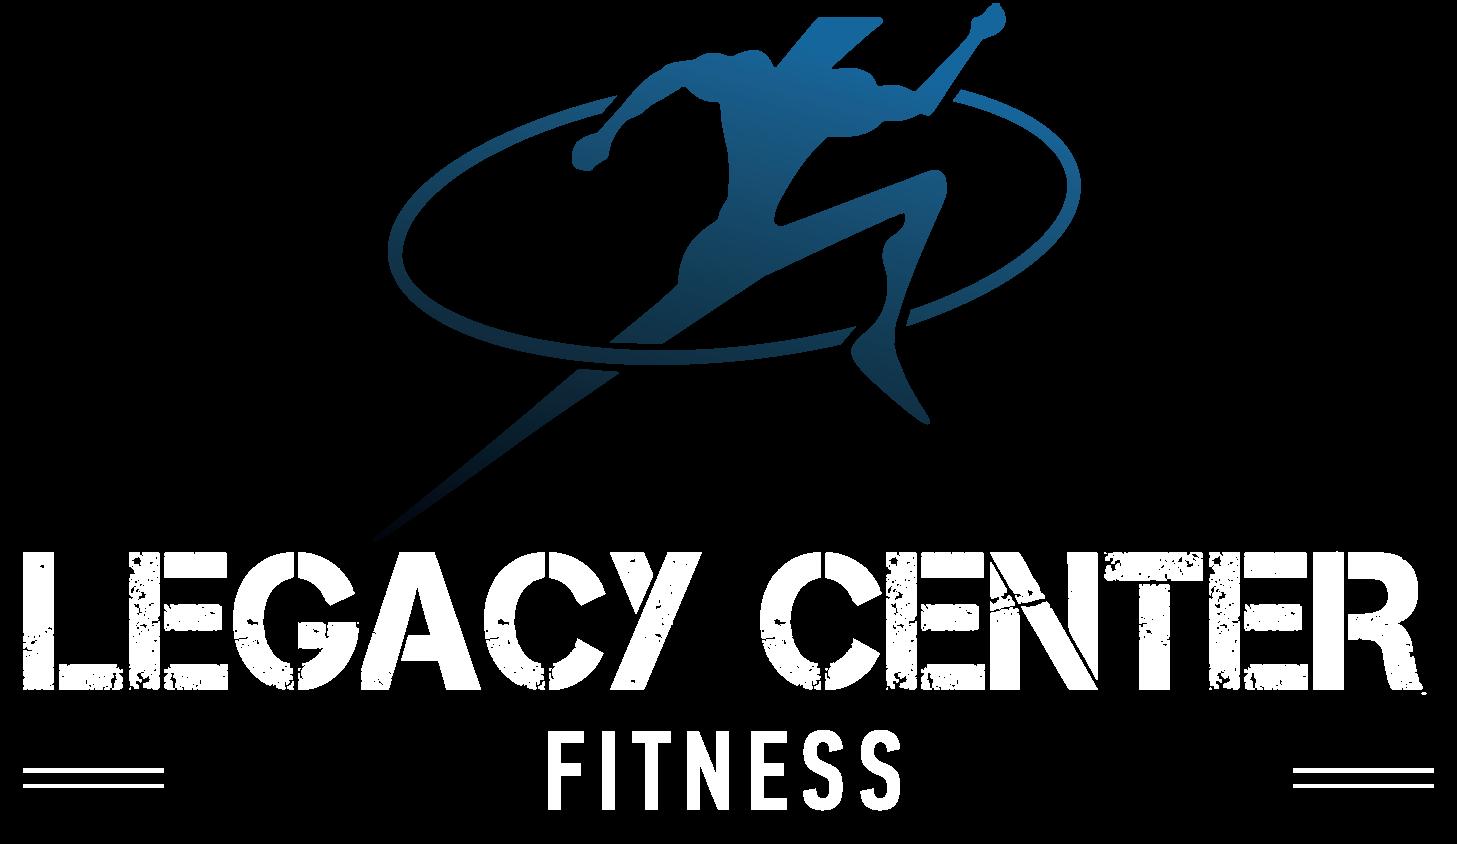 Gym clipart sport complex. Level access legacy center